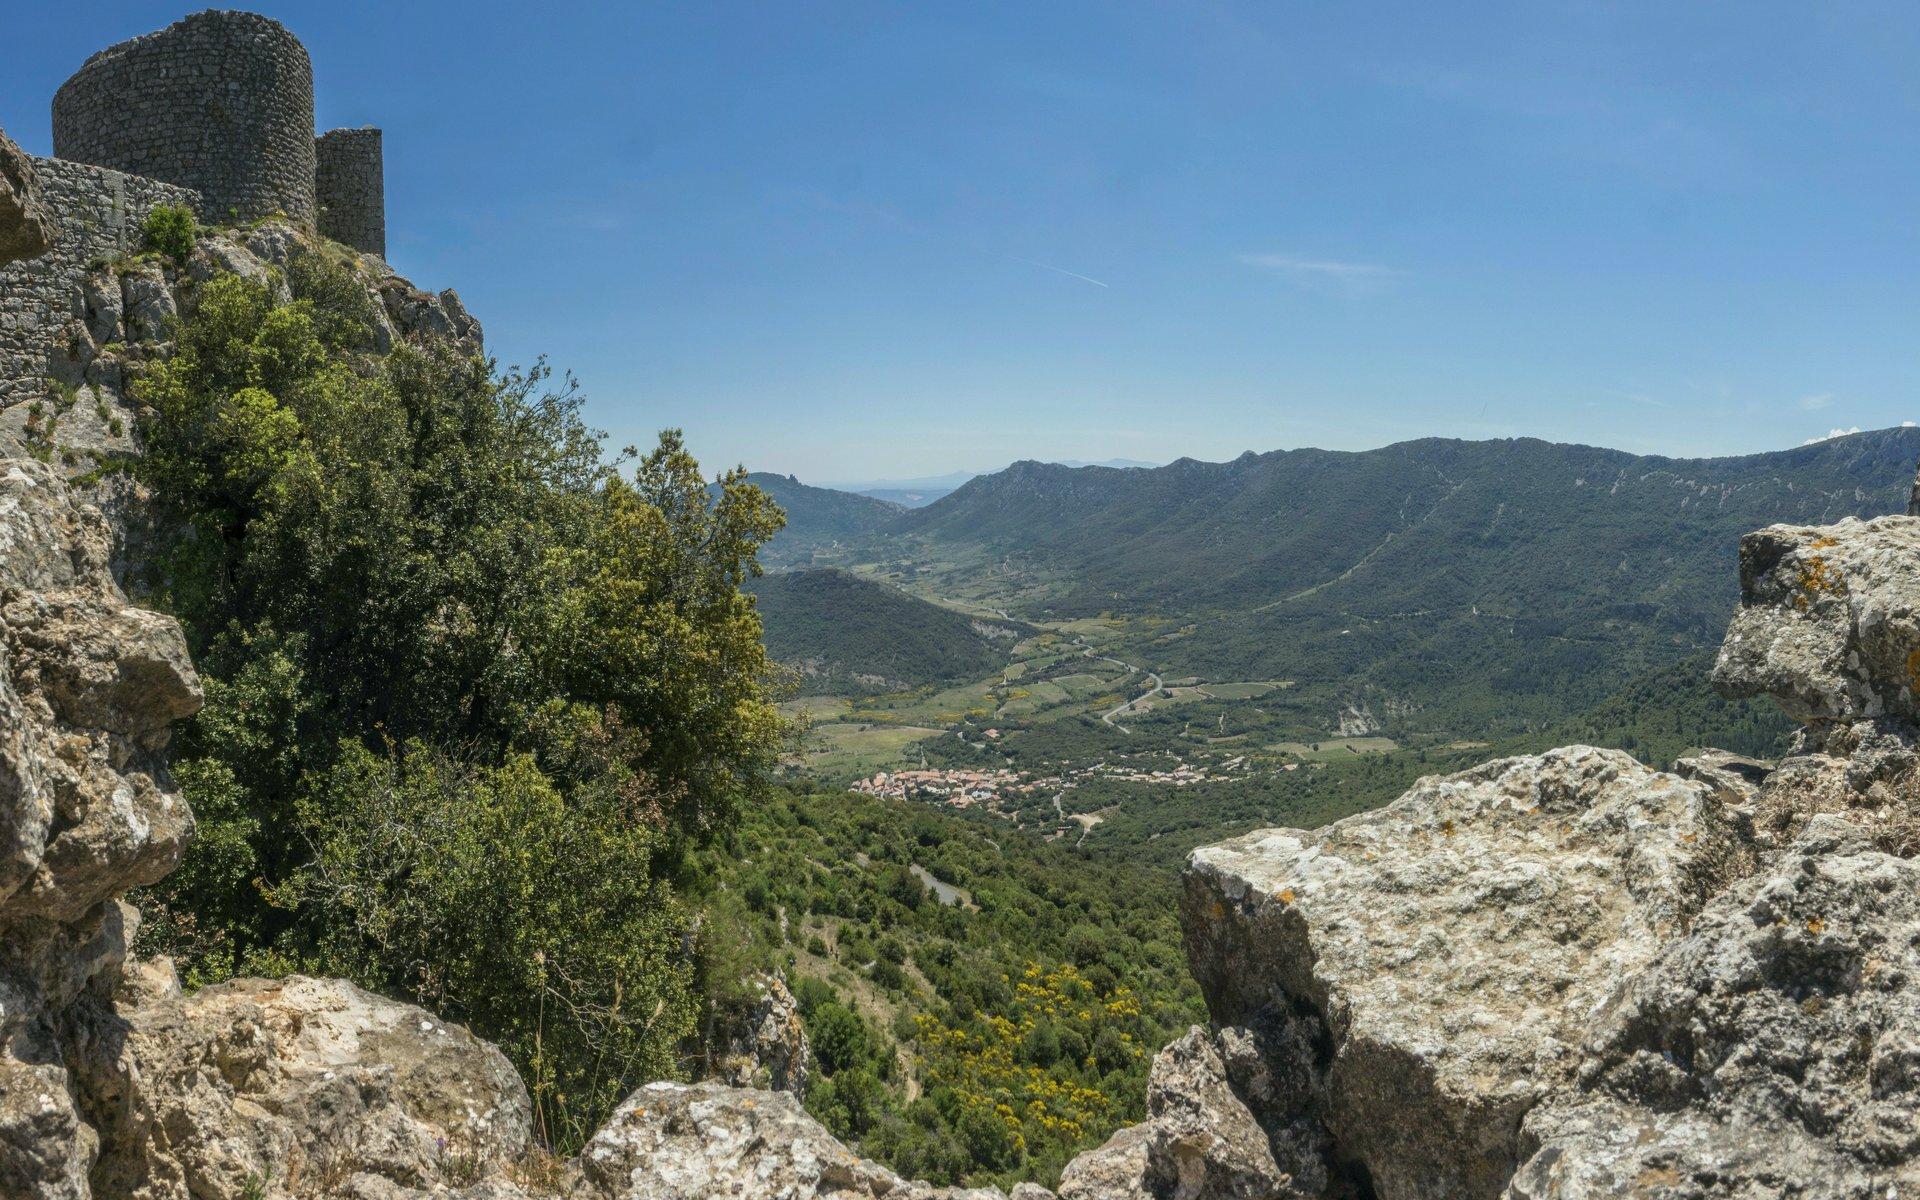 Blick von der mittleren Ringmauer vom Château de Peyrepertuse auf Duilhac-sous-Peyrepertuse